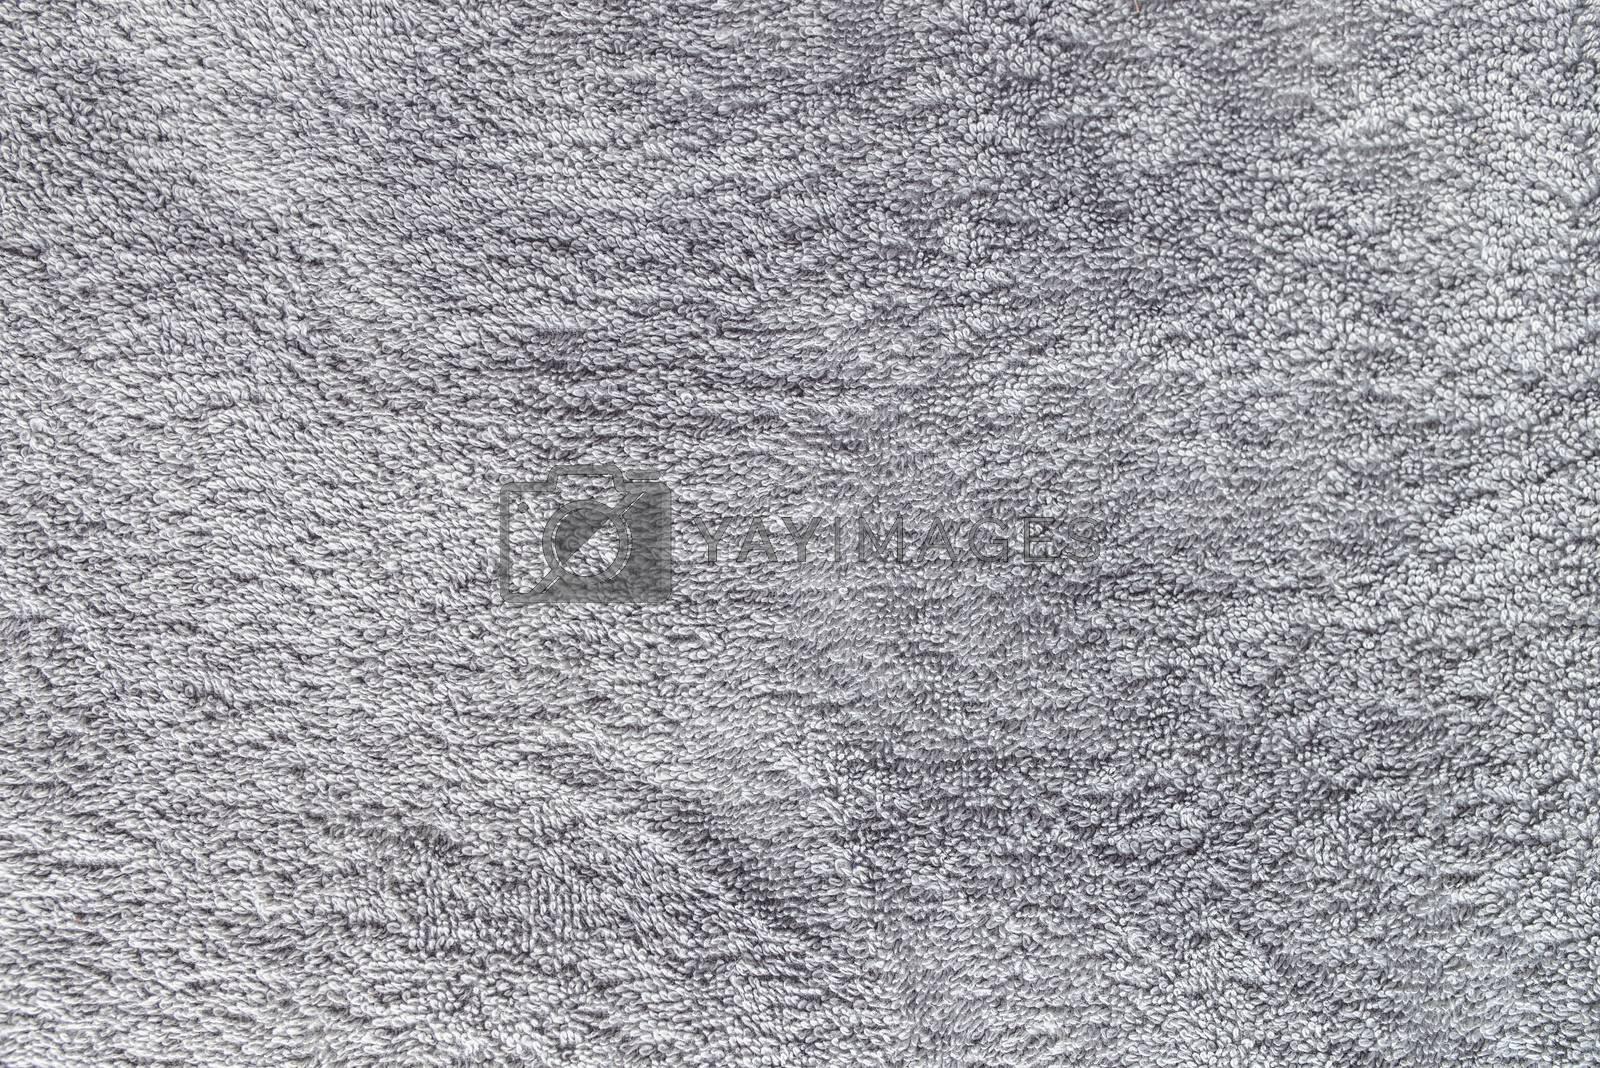 Gray towel texture, clean bath cloth as background